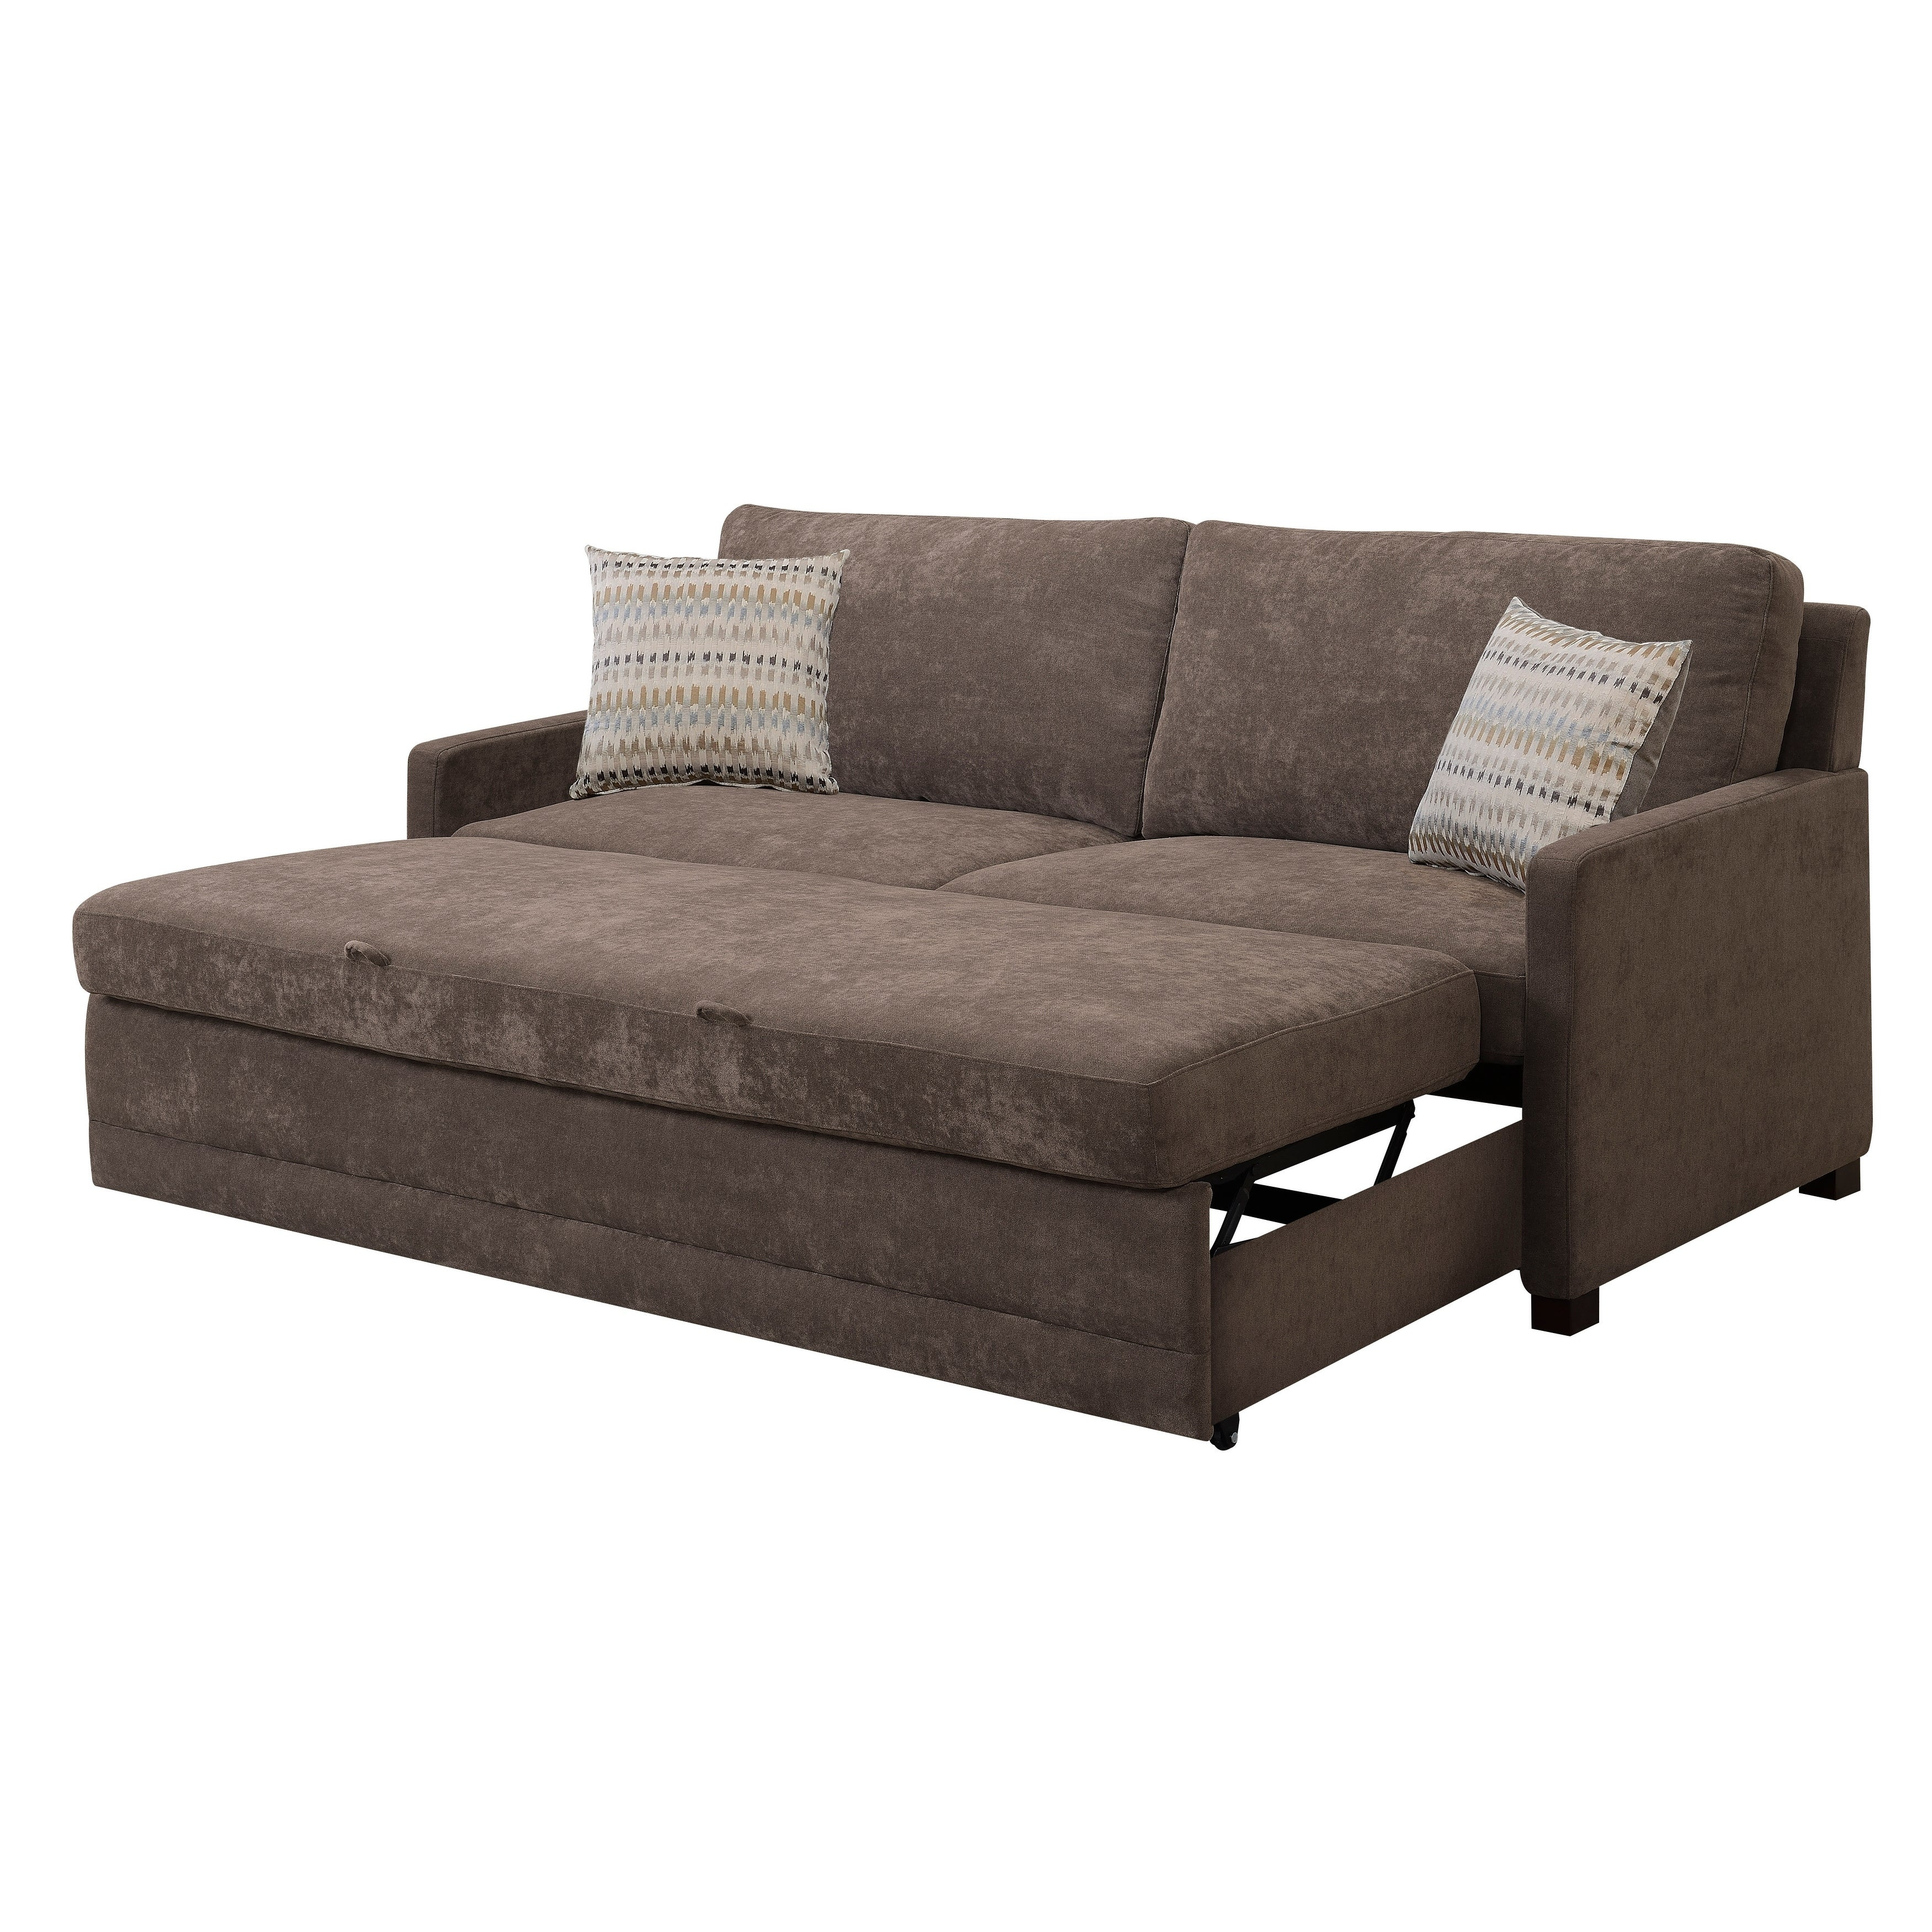 Serta Salinas Dream Convertible Sofa Queen Brown